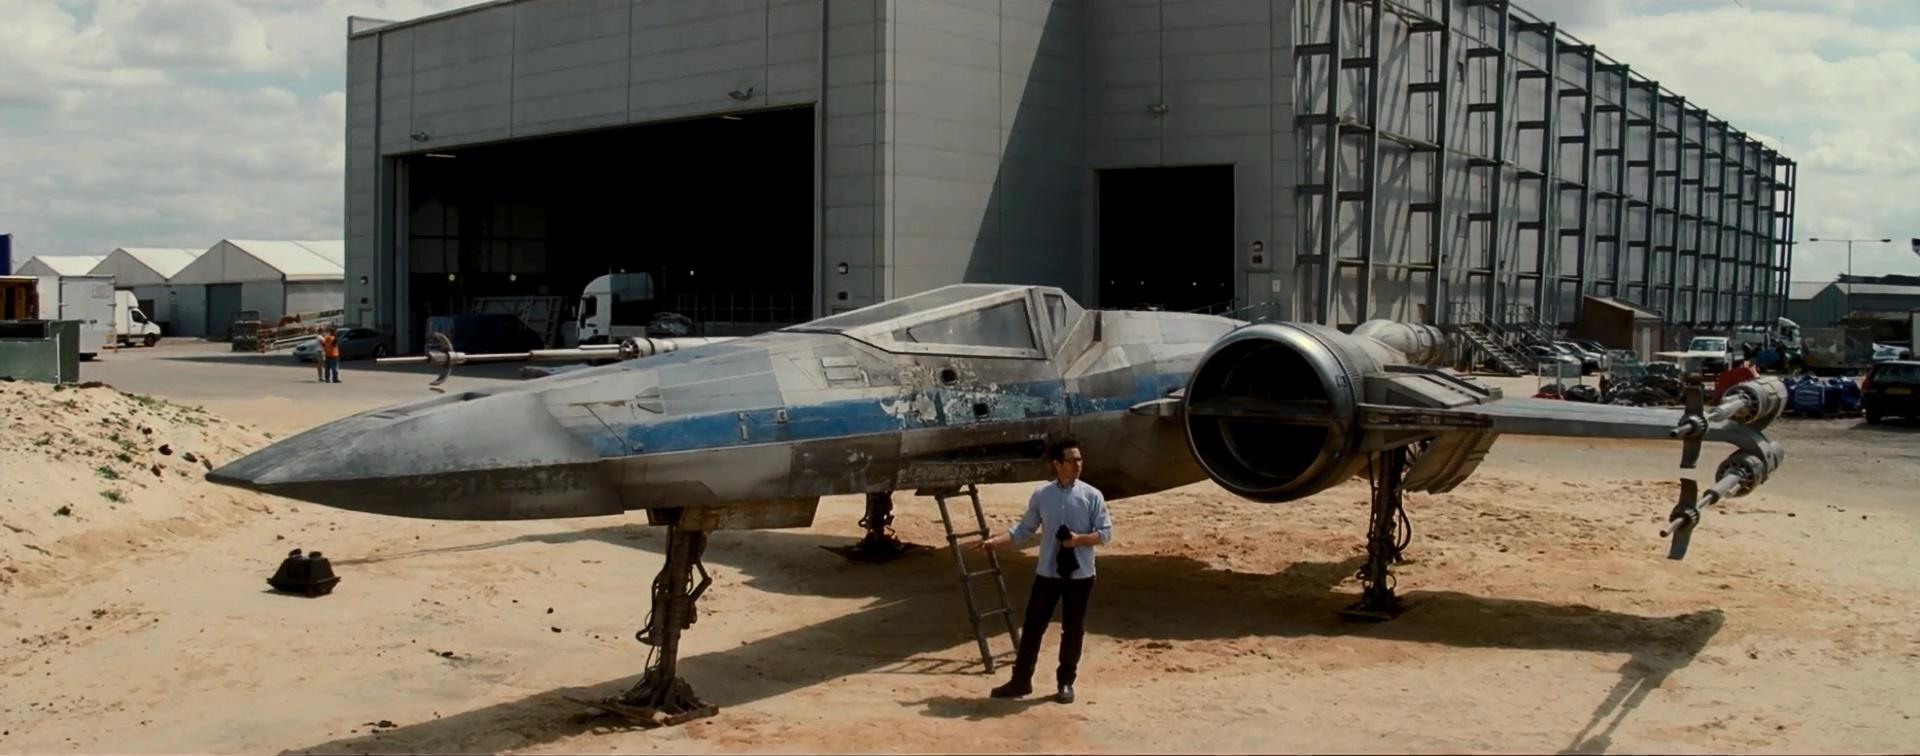 J·J·艾布拉姆斯曝光《星球大战7》全新片场X翼战机视频花絮